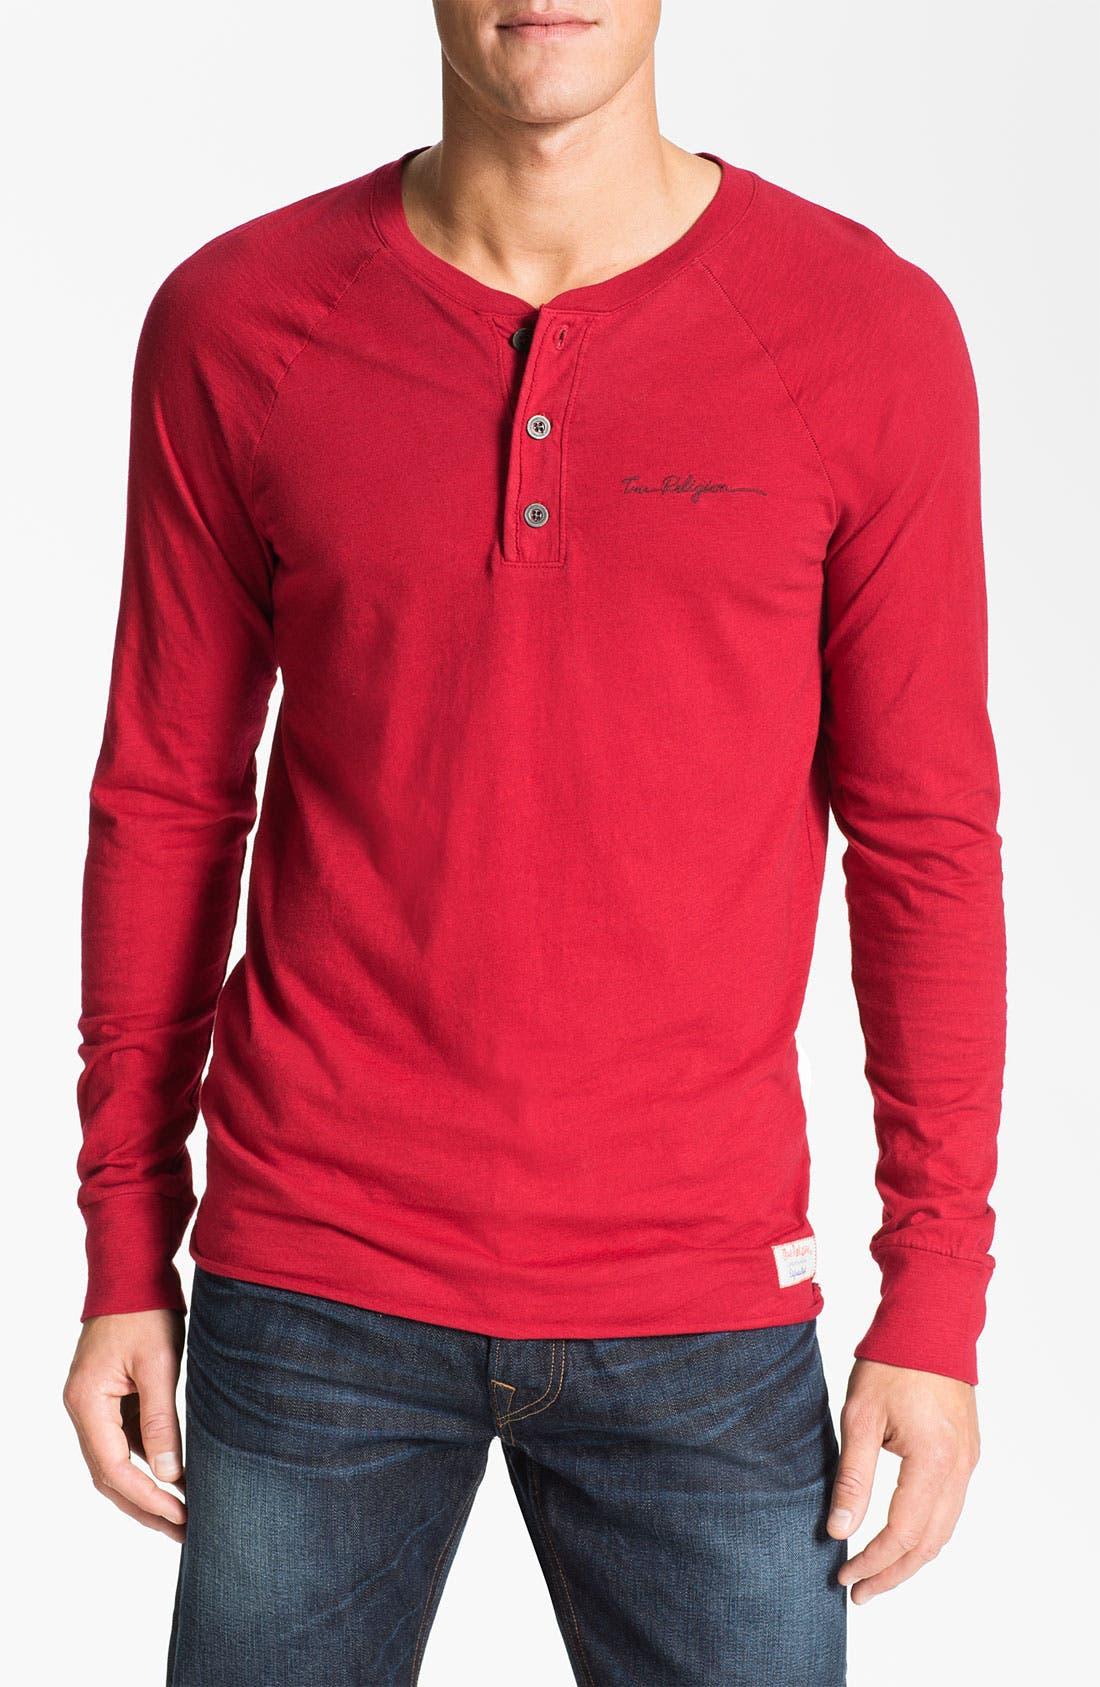 Alternate Image 1 Selected - True Religion Brand Jeans Slub Jersey Henley